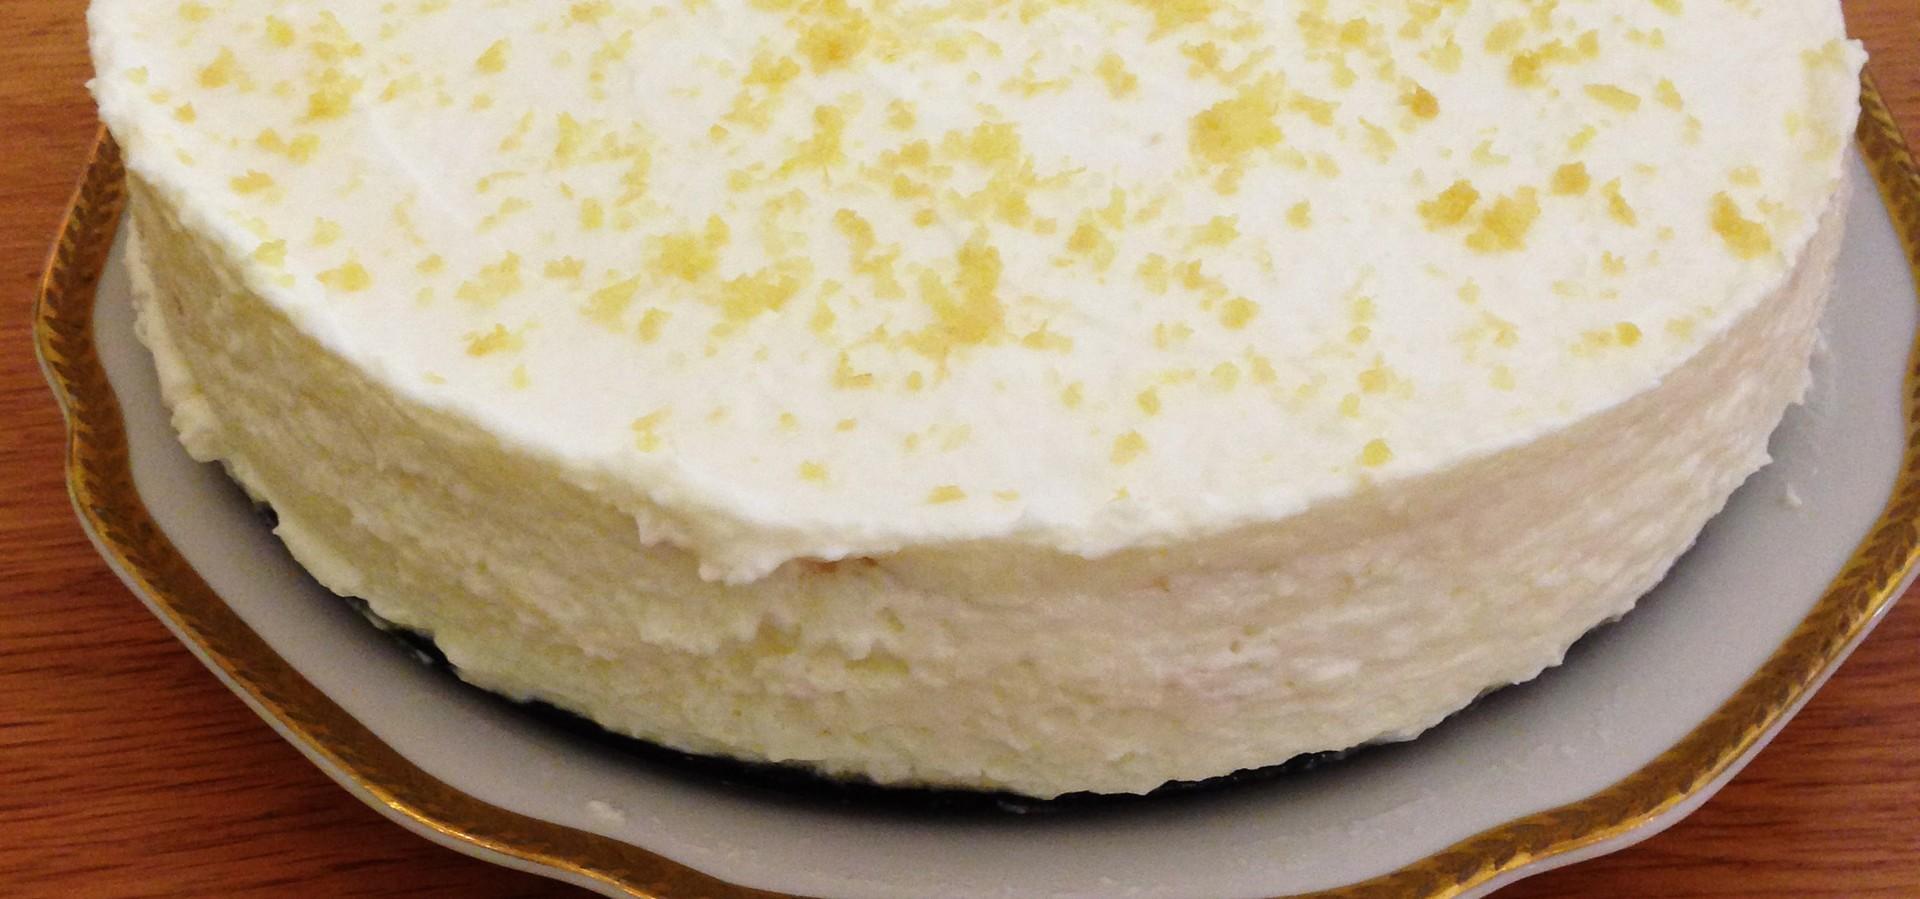 Lemon Ripple Cheesecake